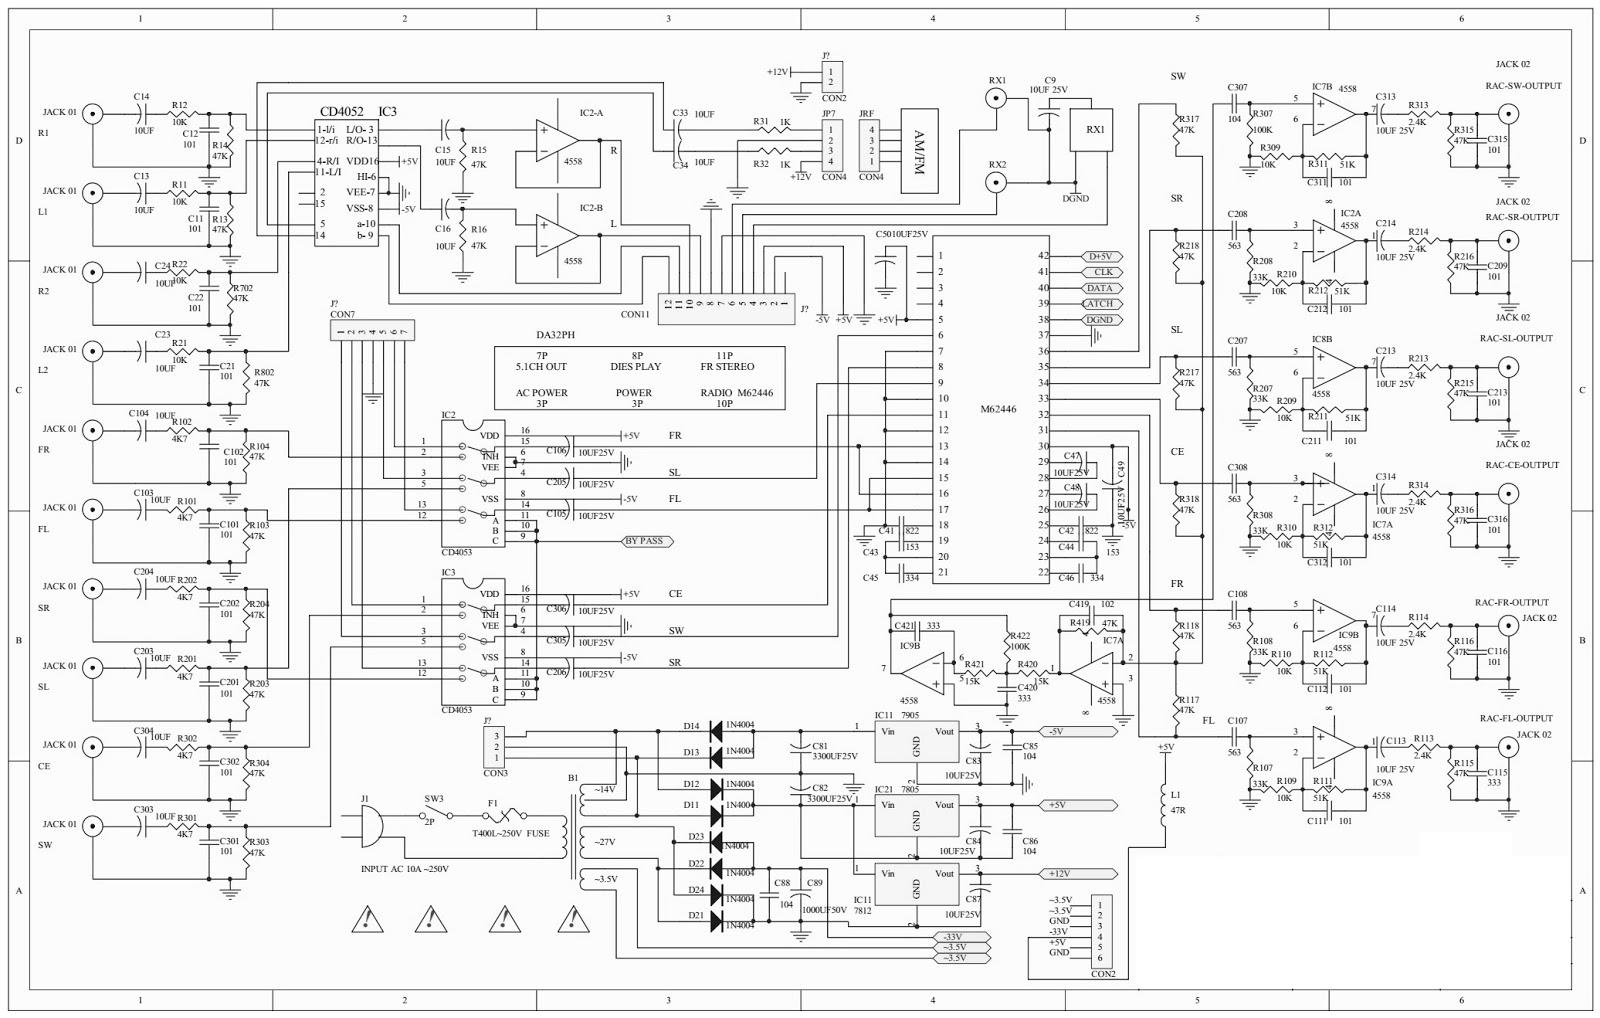 Microlab Ah500 Hts